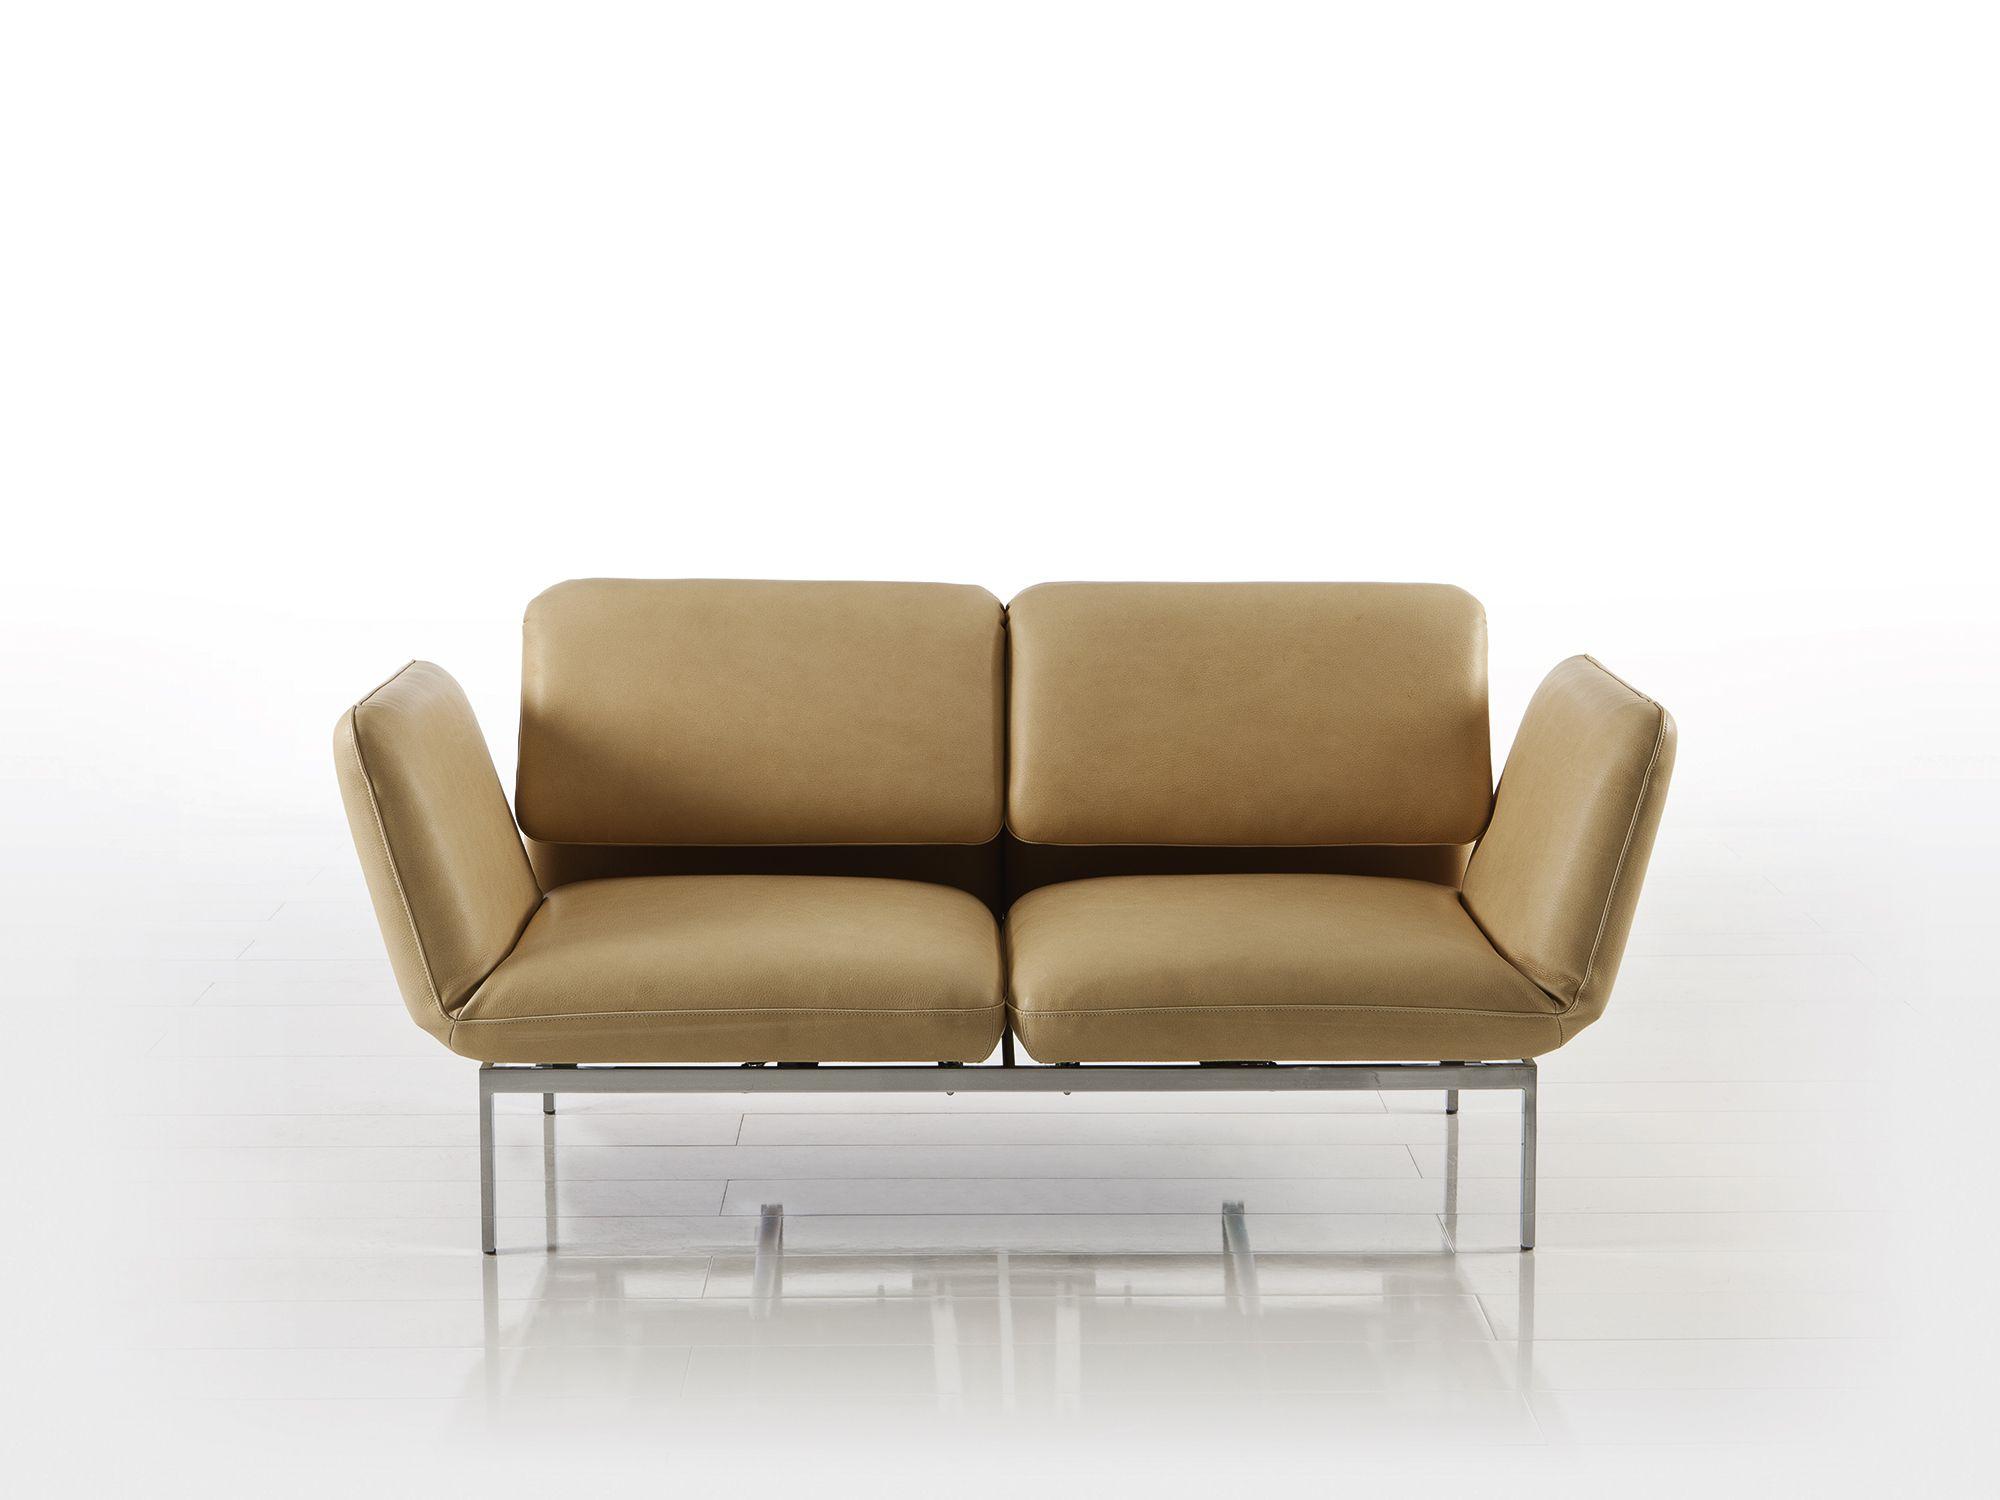 br hl sofa bezug waschen home image ideen. Black Bedroom Furniture Sets. Home Design Ideas